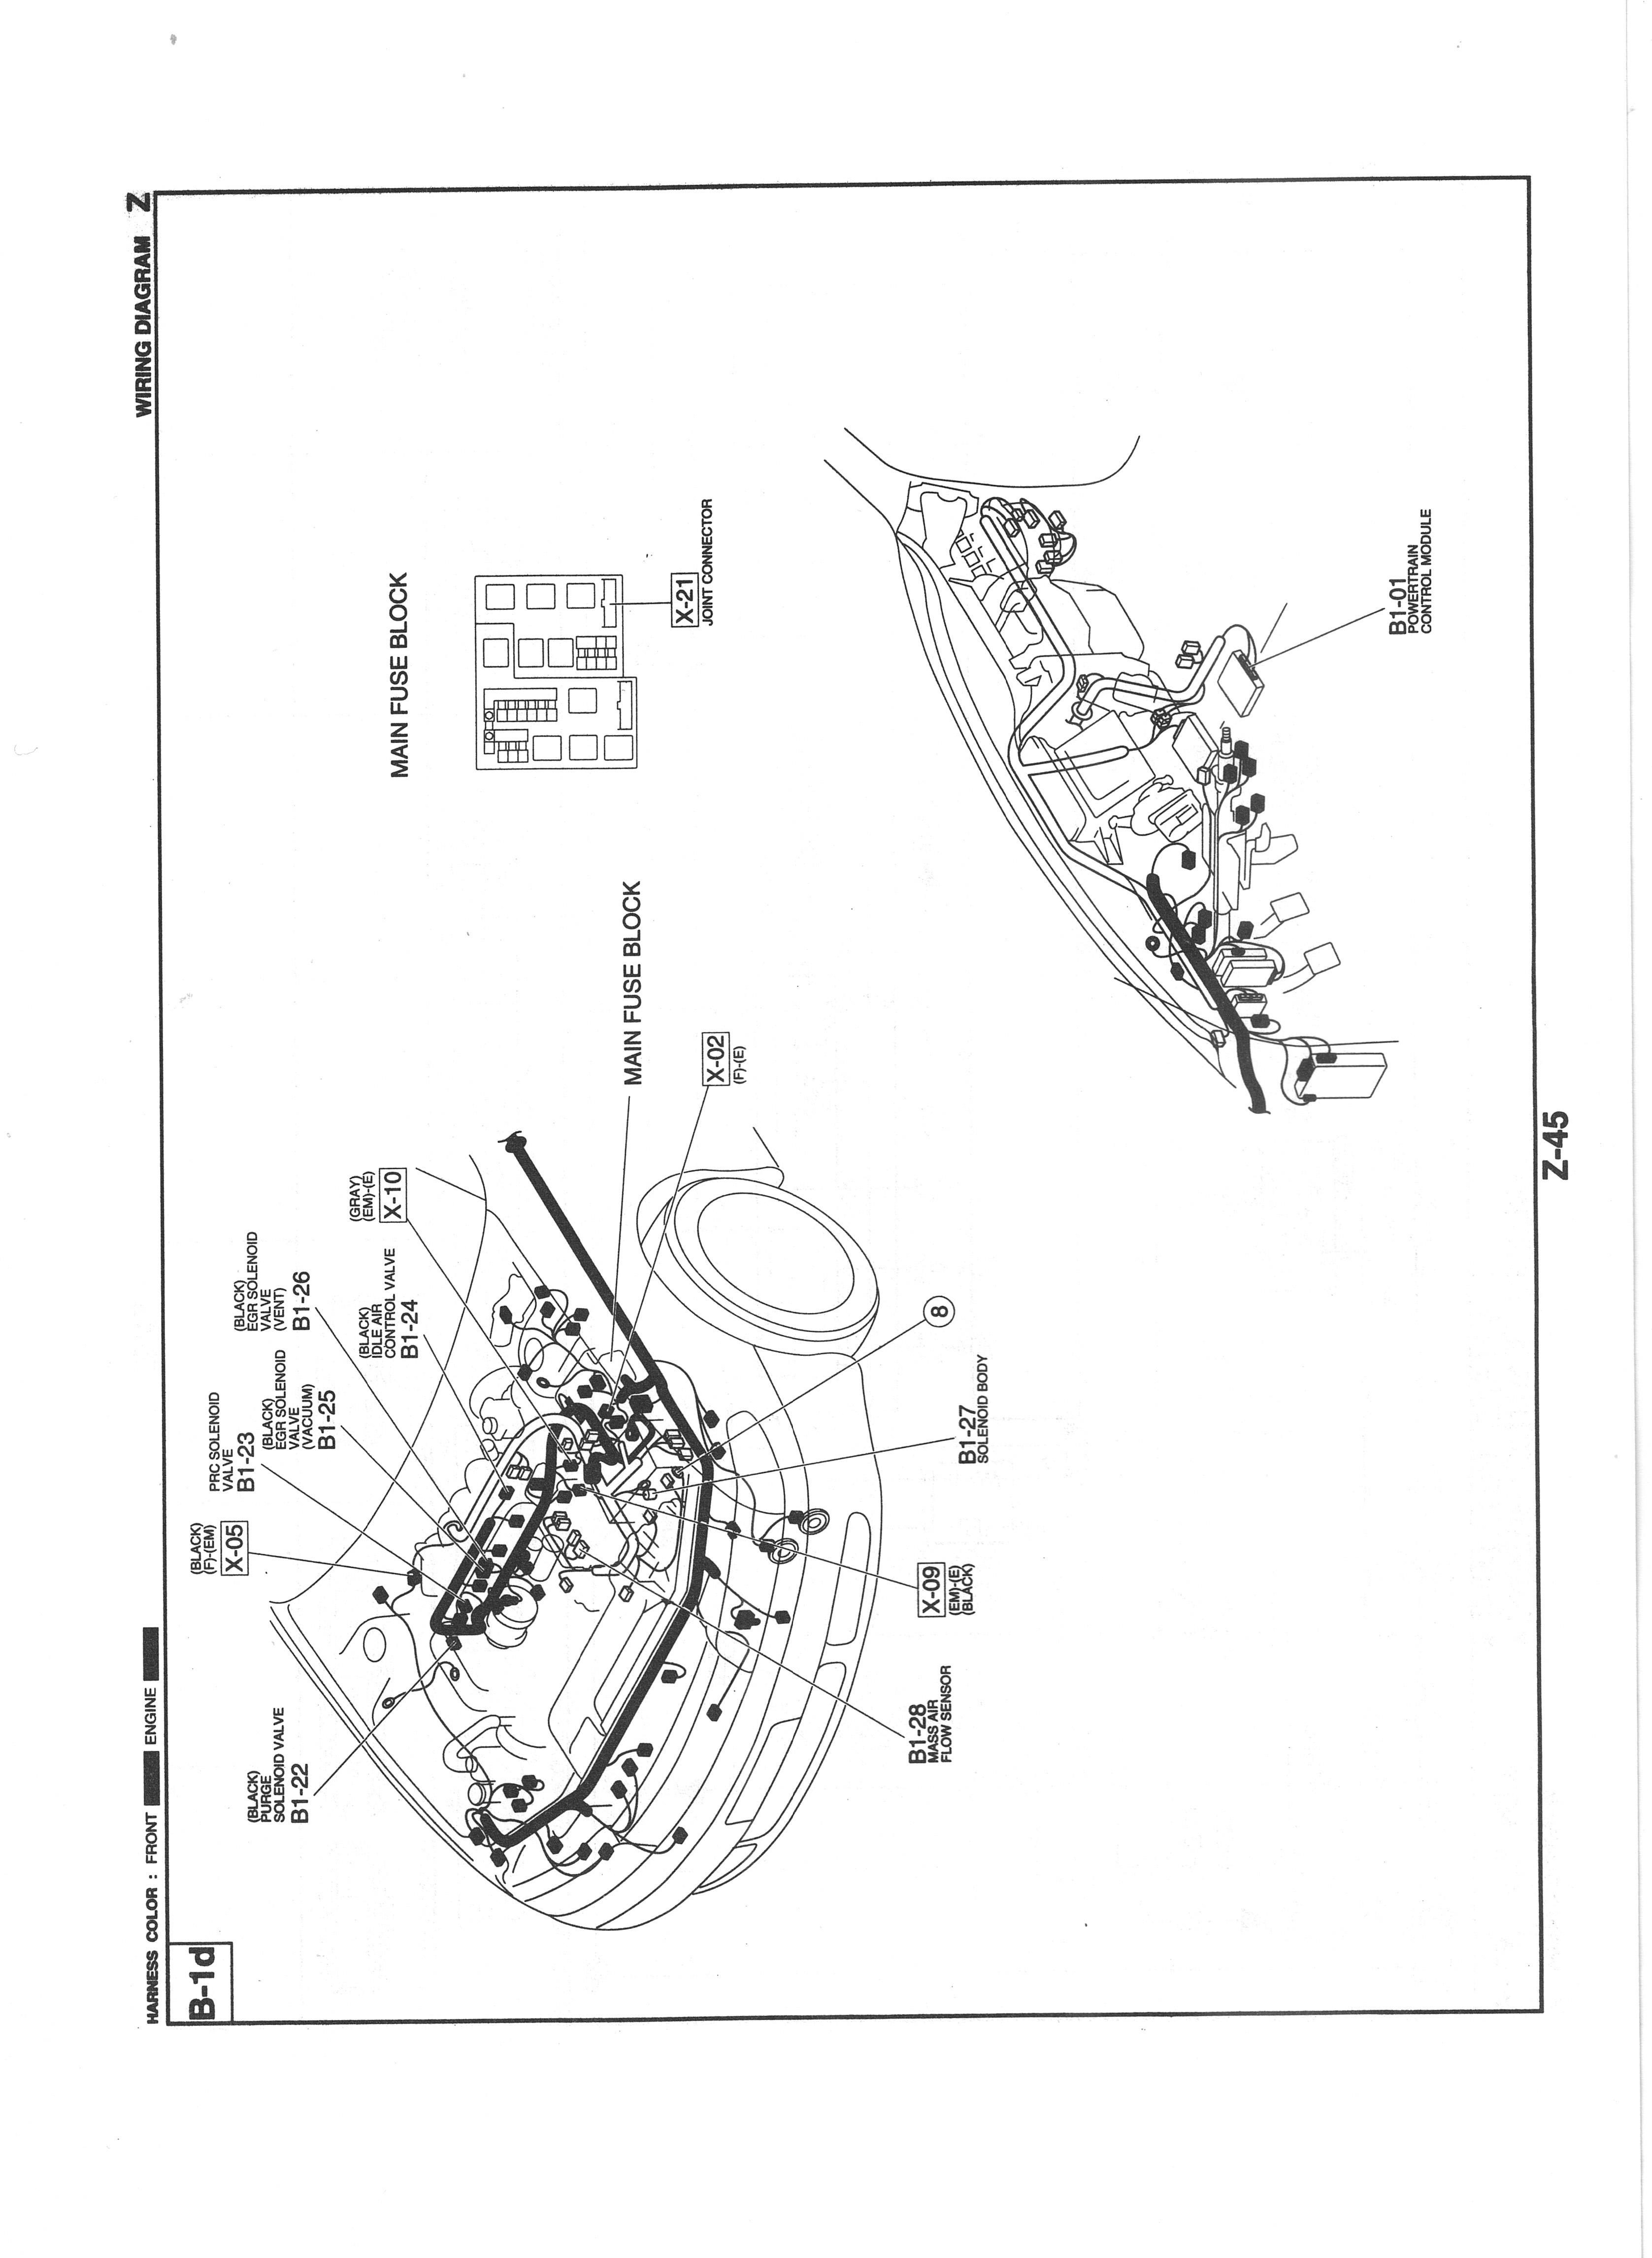 Us Mazda 626 Mx 6 Work Shop Manuals Scans 1995 Flow Control Valve Diagram On Egr Solenoid Circuit Z 045 1174kb Aug 24 2014 055040 Am